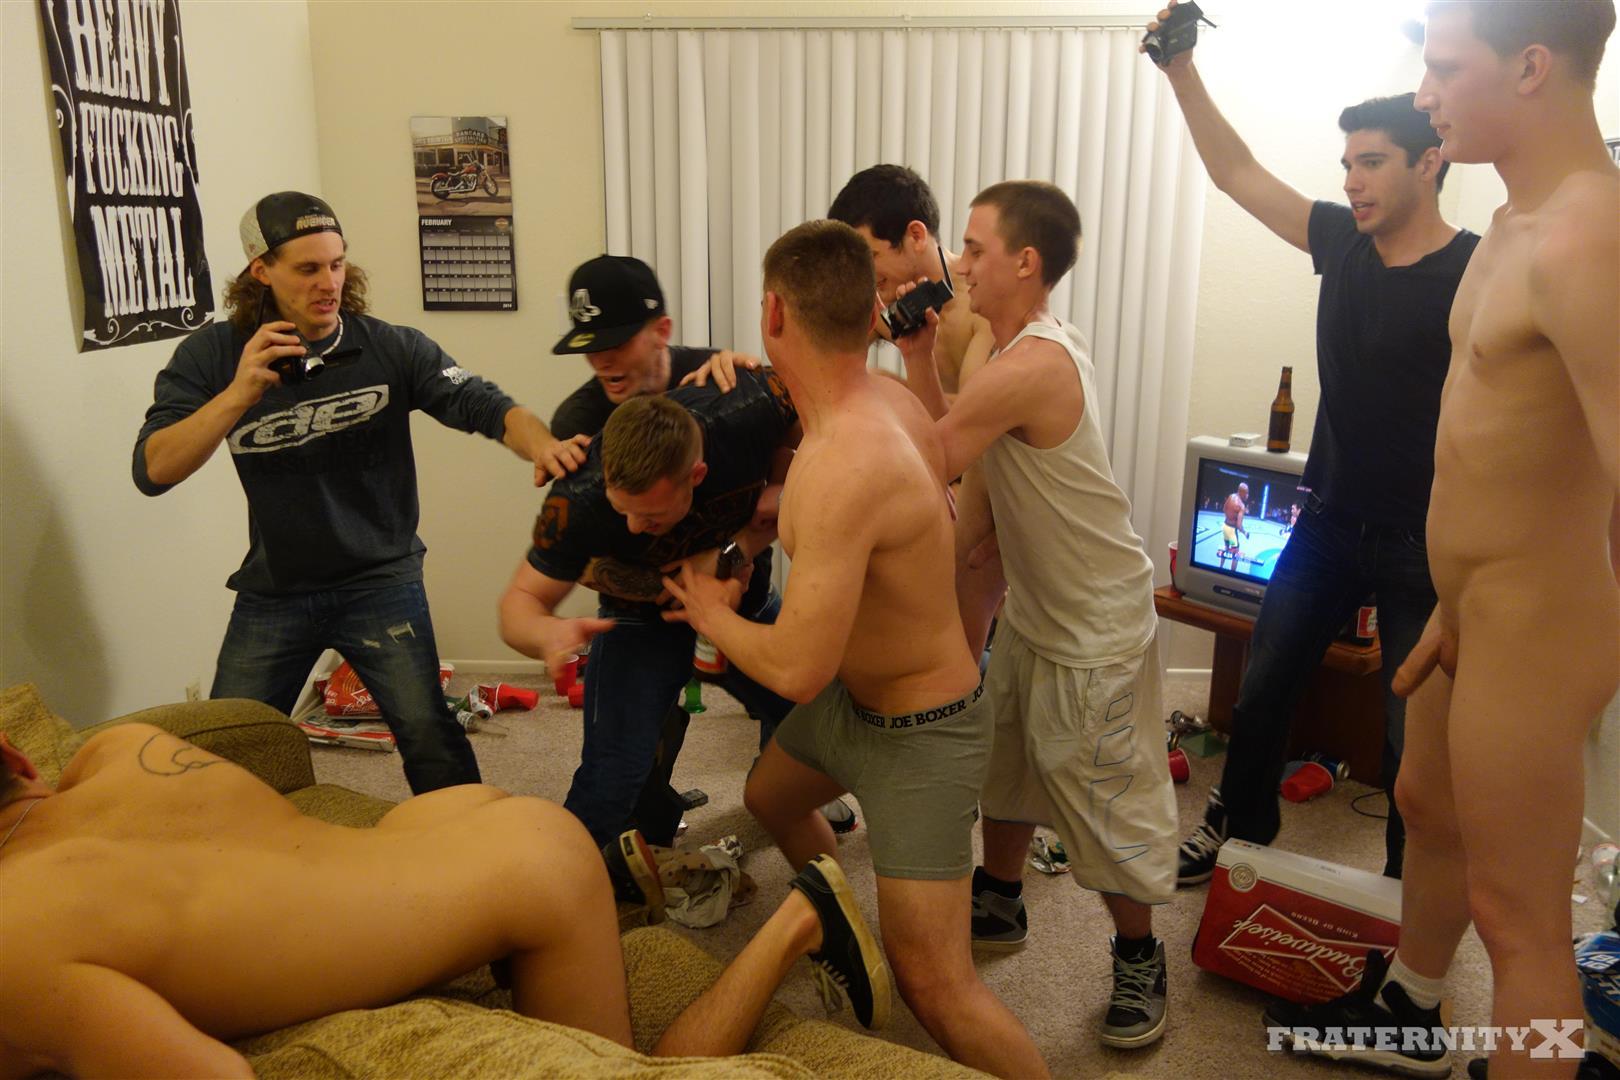 Fraternity-X-Brad-Pledge-Takes-5-Bareback-Cocks-Up-The-Ass-Amateur-Gay-Porn-48 Fraternity Pledge Takes 5 Bareback Cocks Up The Ass